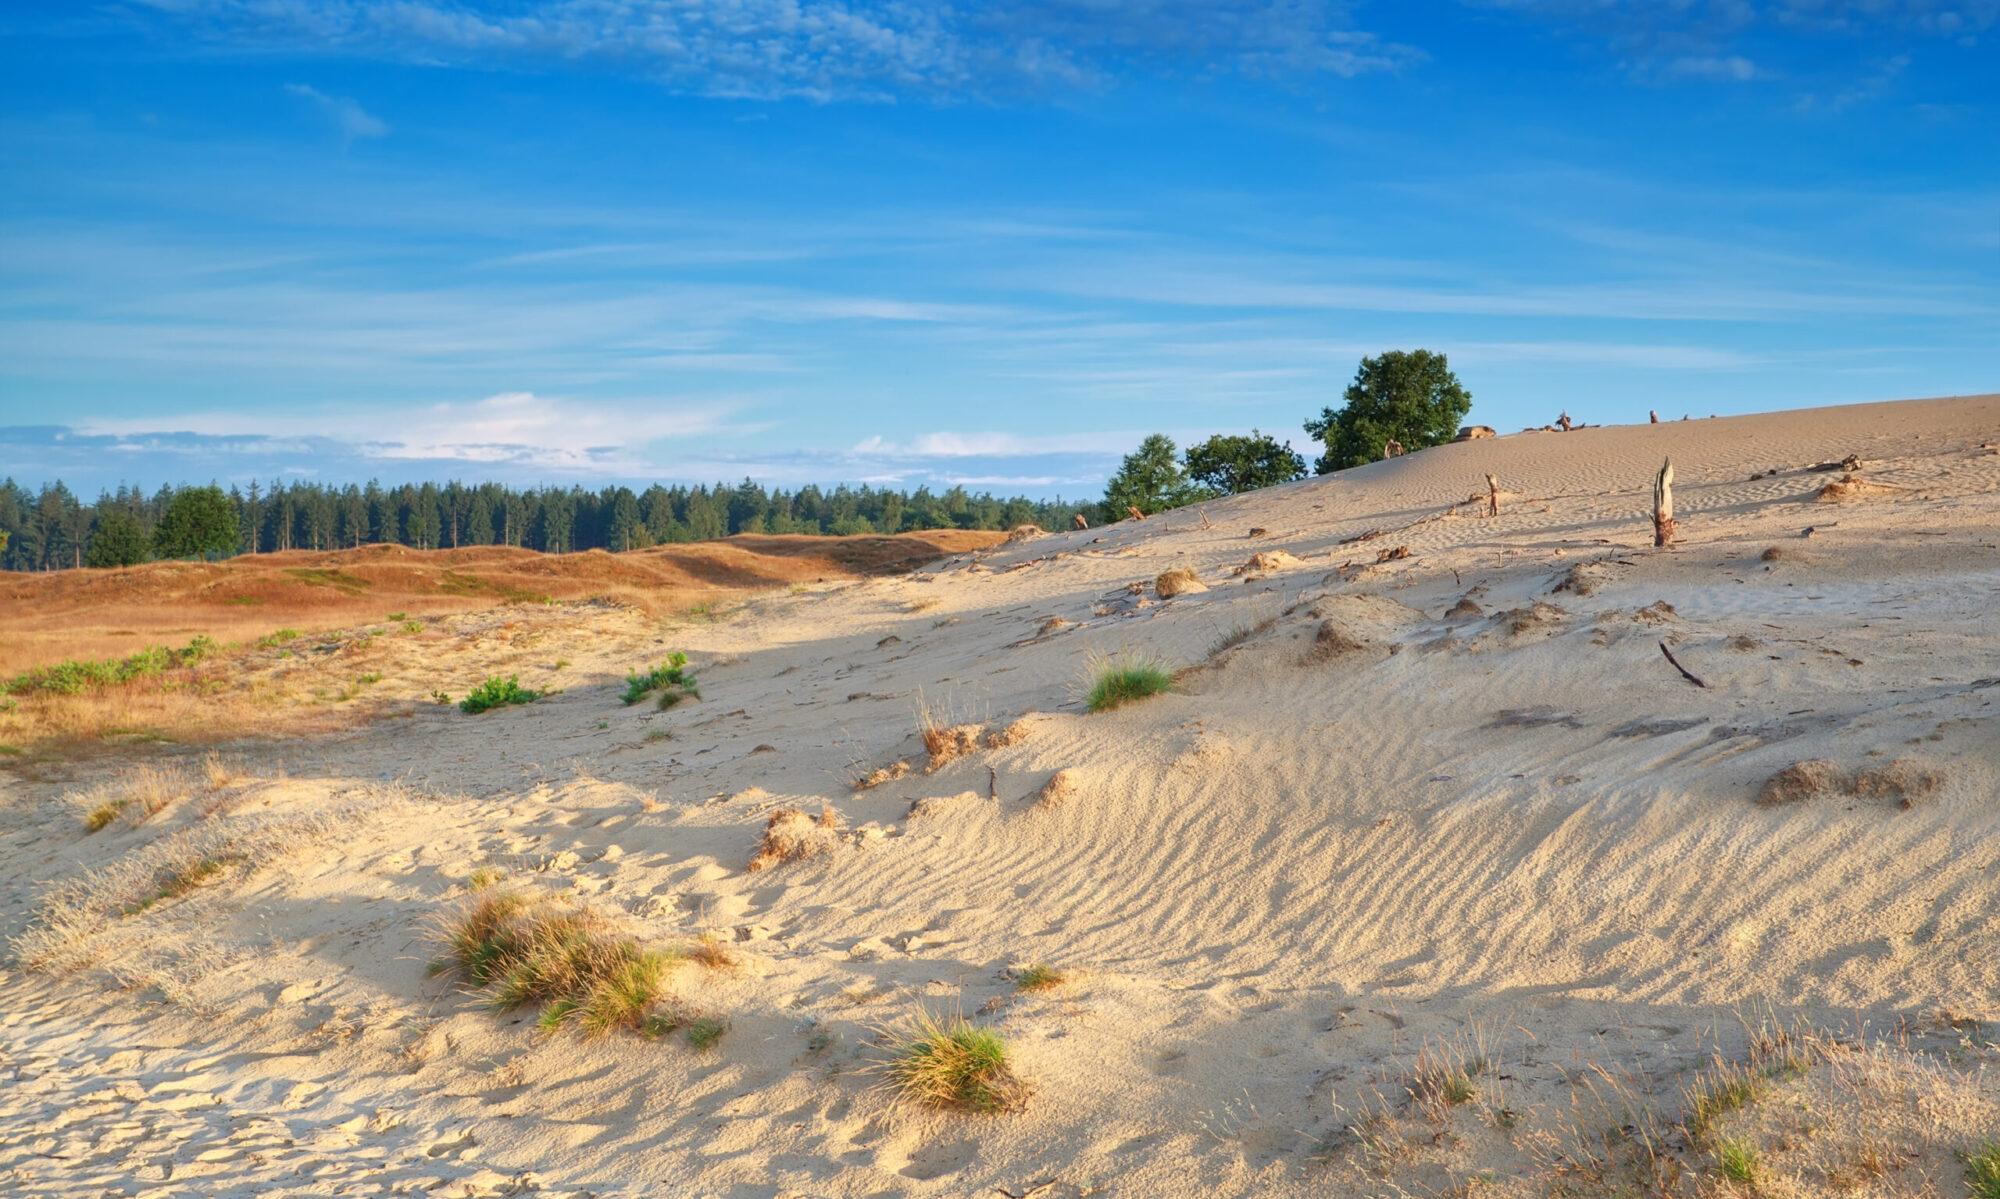 Vakantie in Nationaal Park Drents-Friese Wold